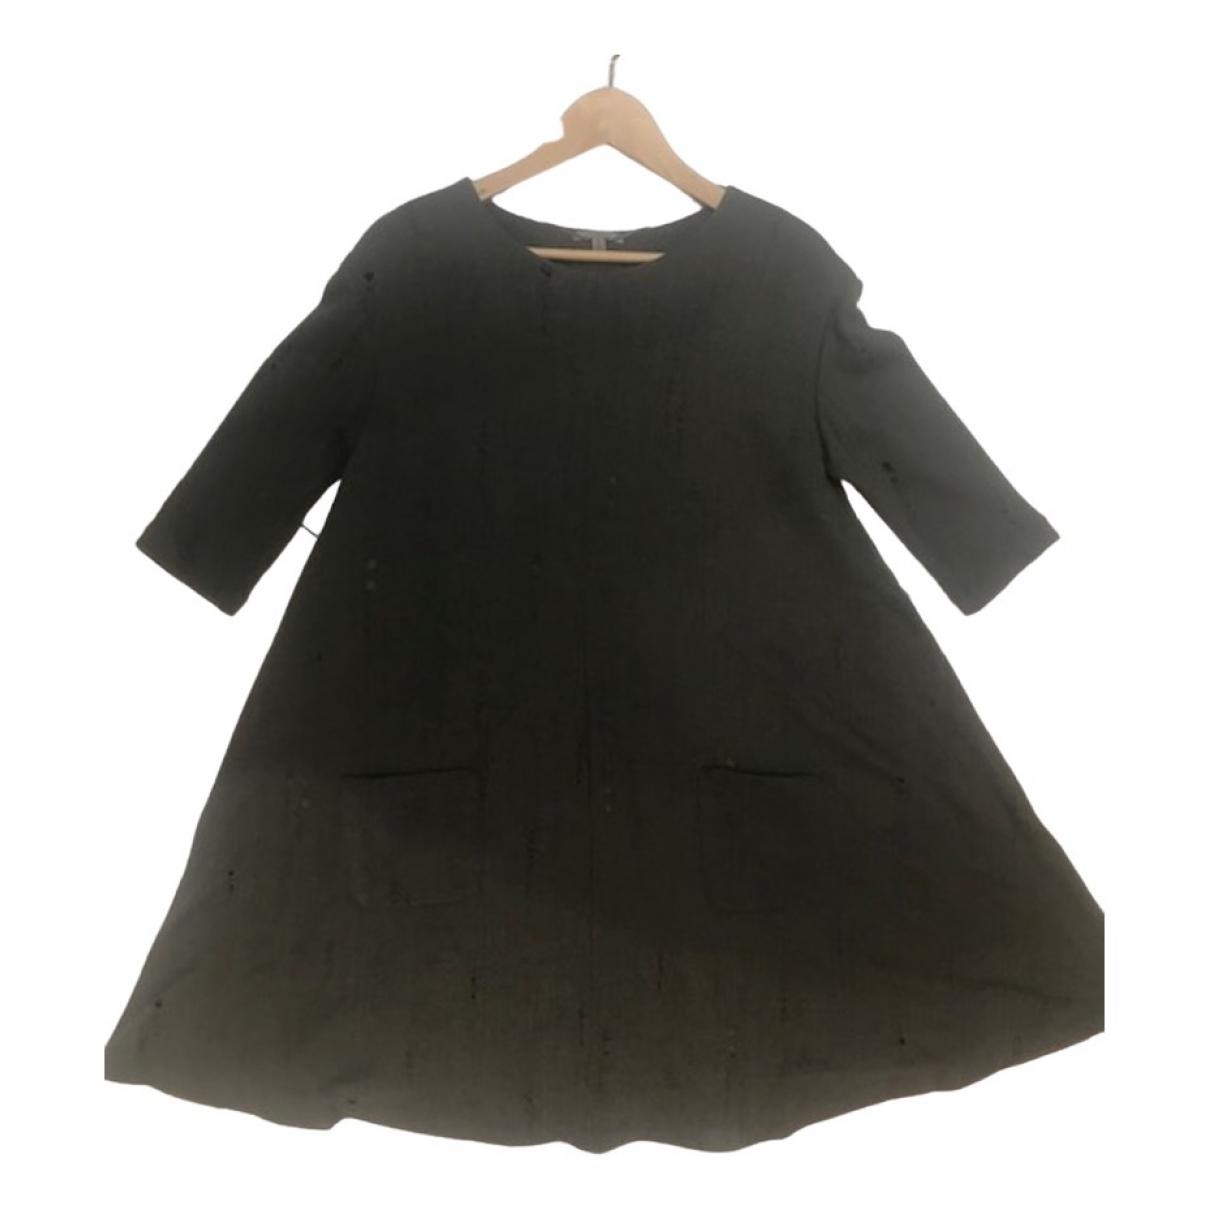 Uterque \N Kleid in  Khaki Wolle